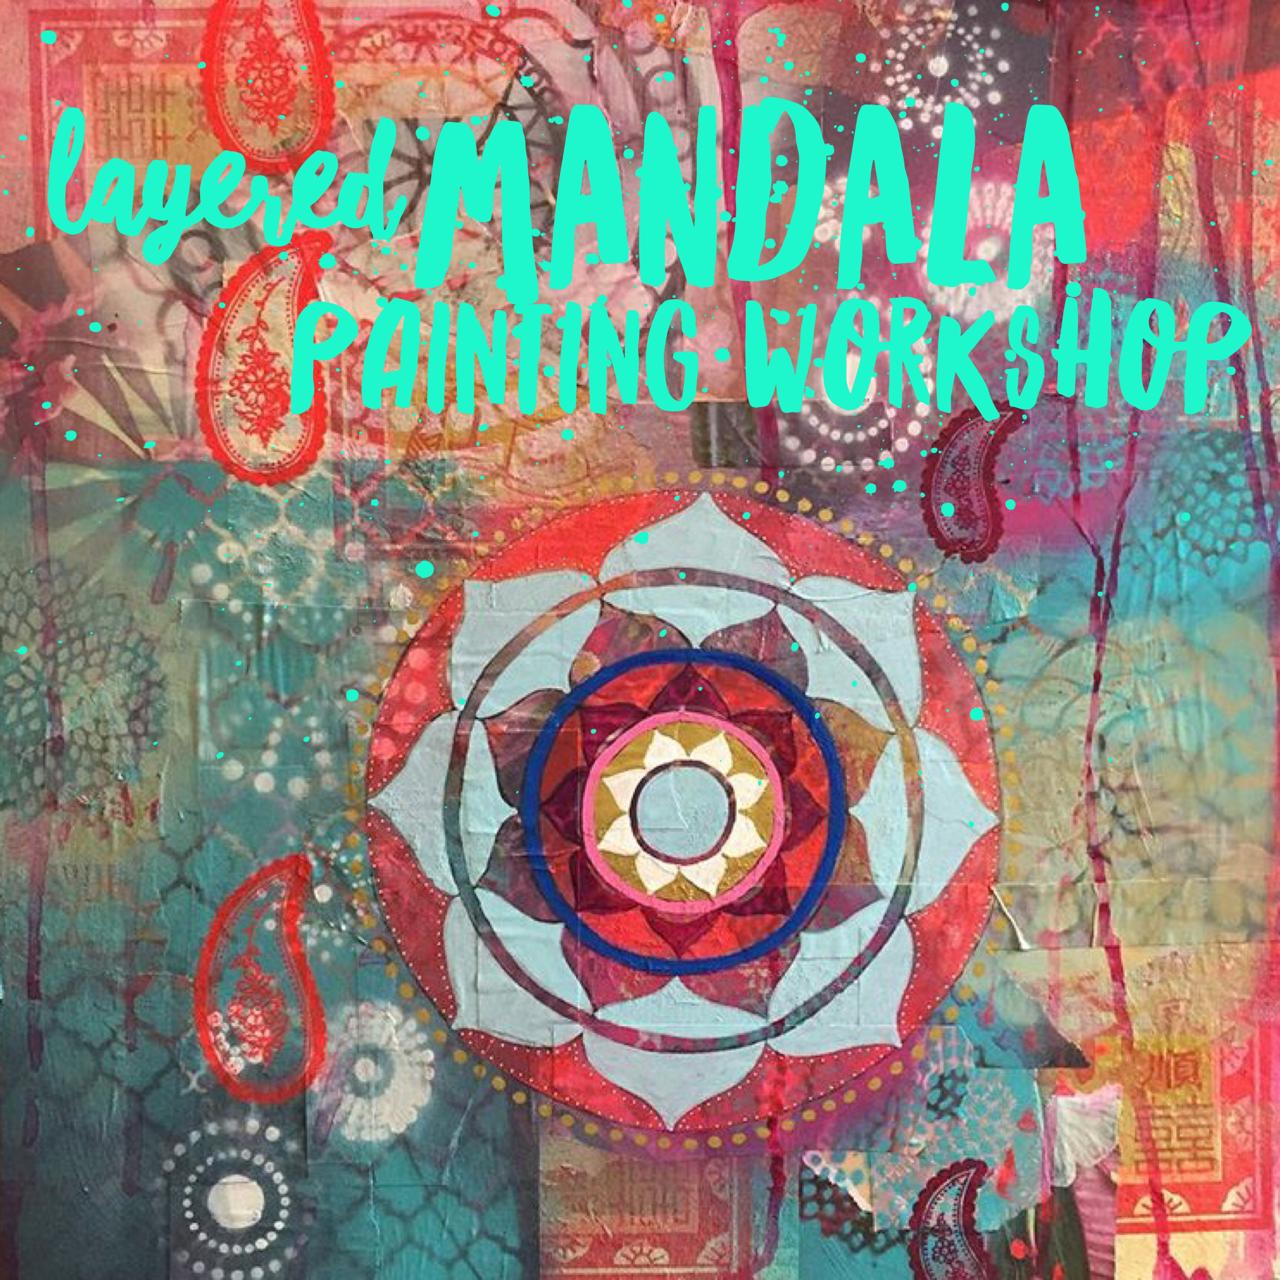 $45 Layered Mandala Painting Workshop